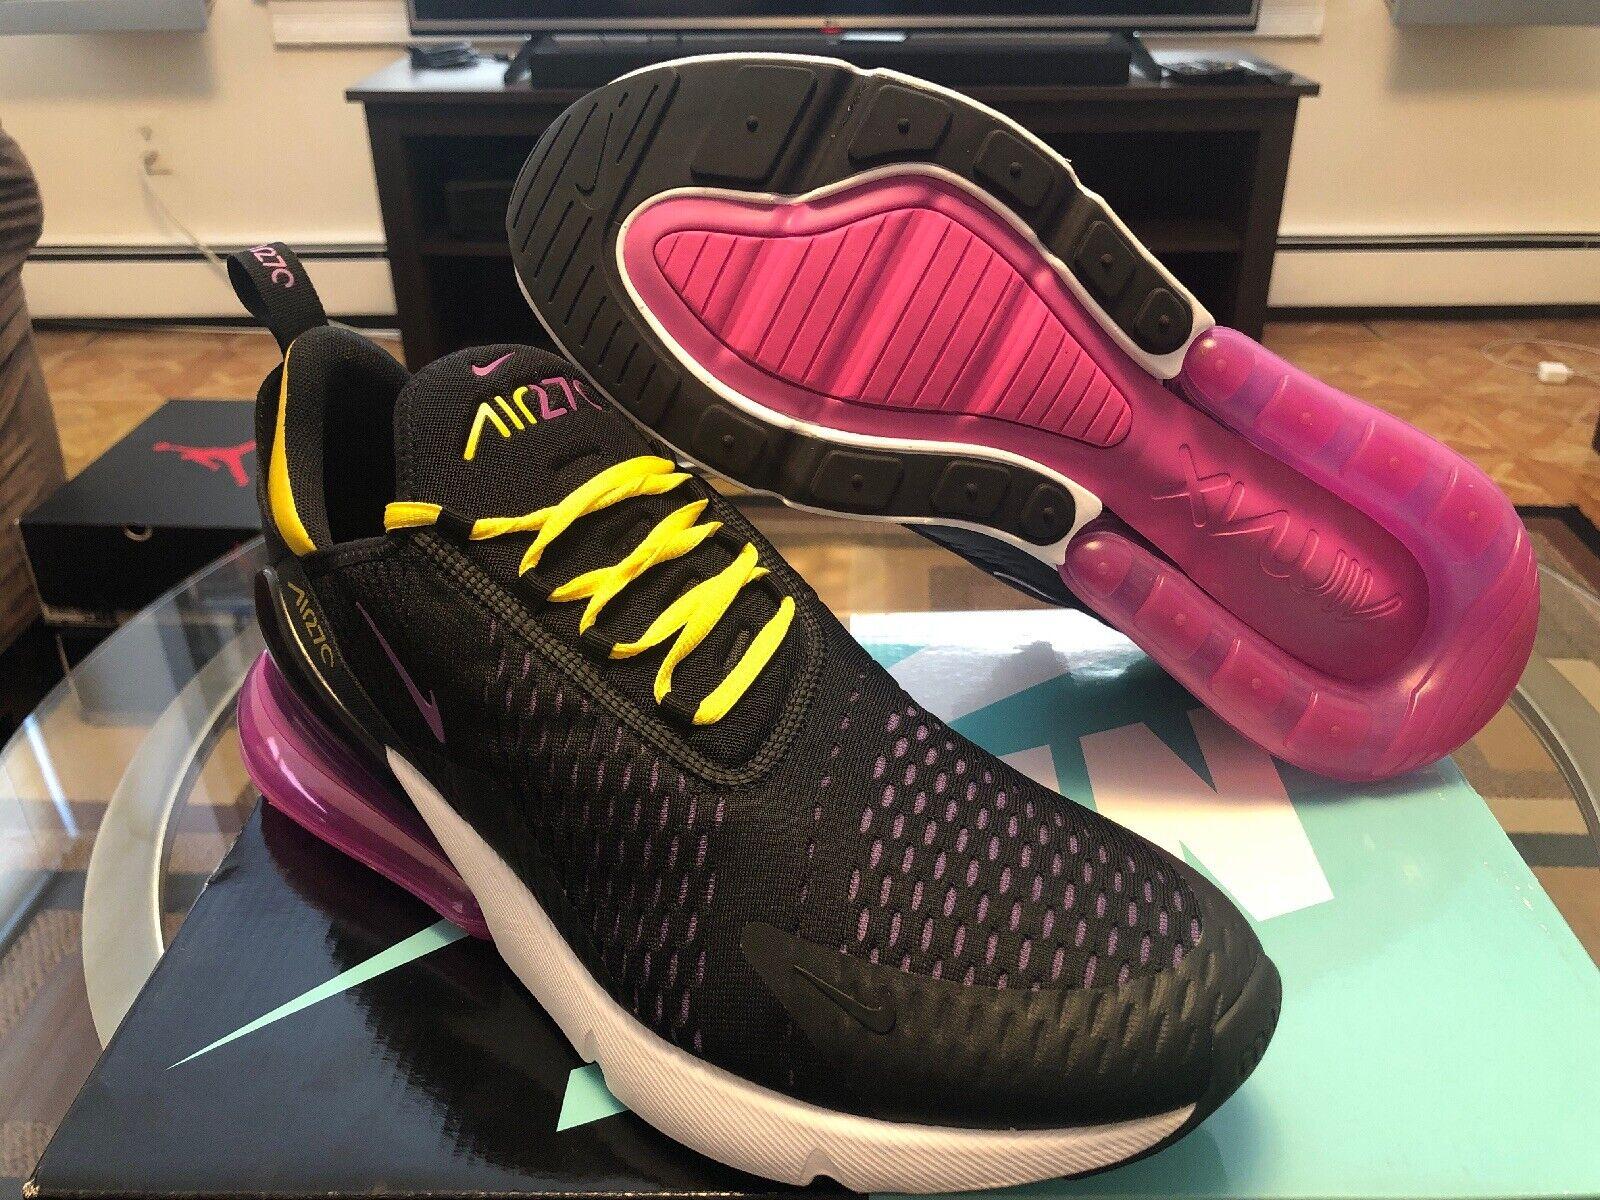 Nike Air Max 901 White University Red AJ7695 100 New Women's US Sz 8.5 Mns Sz 7